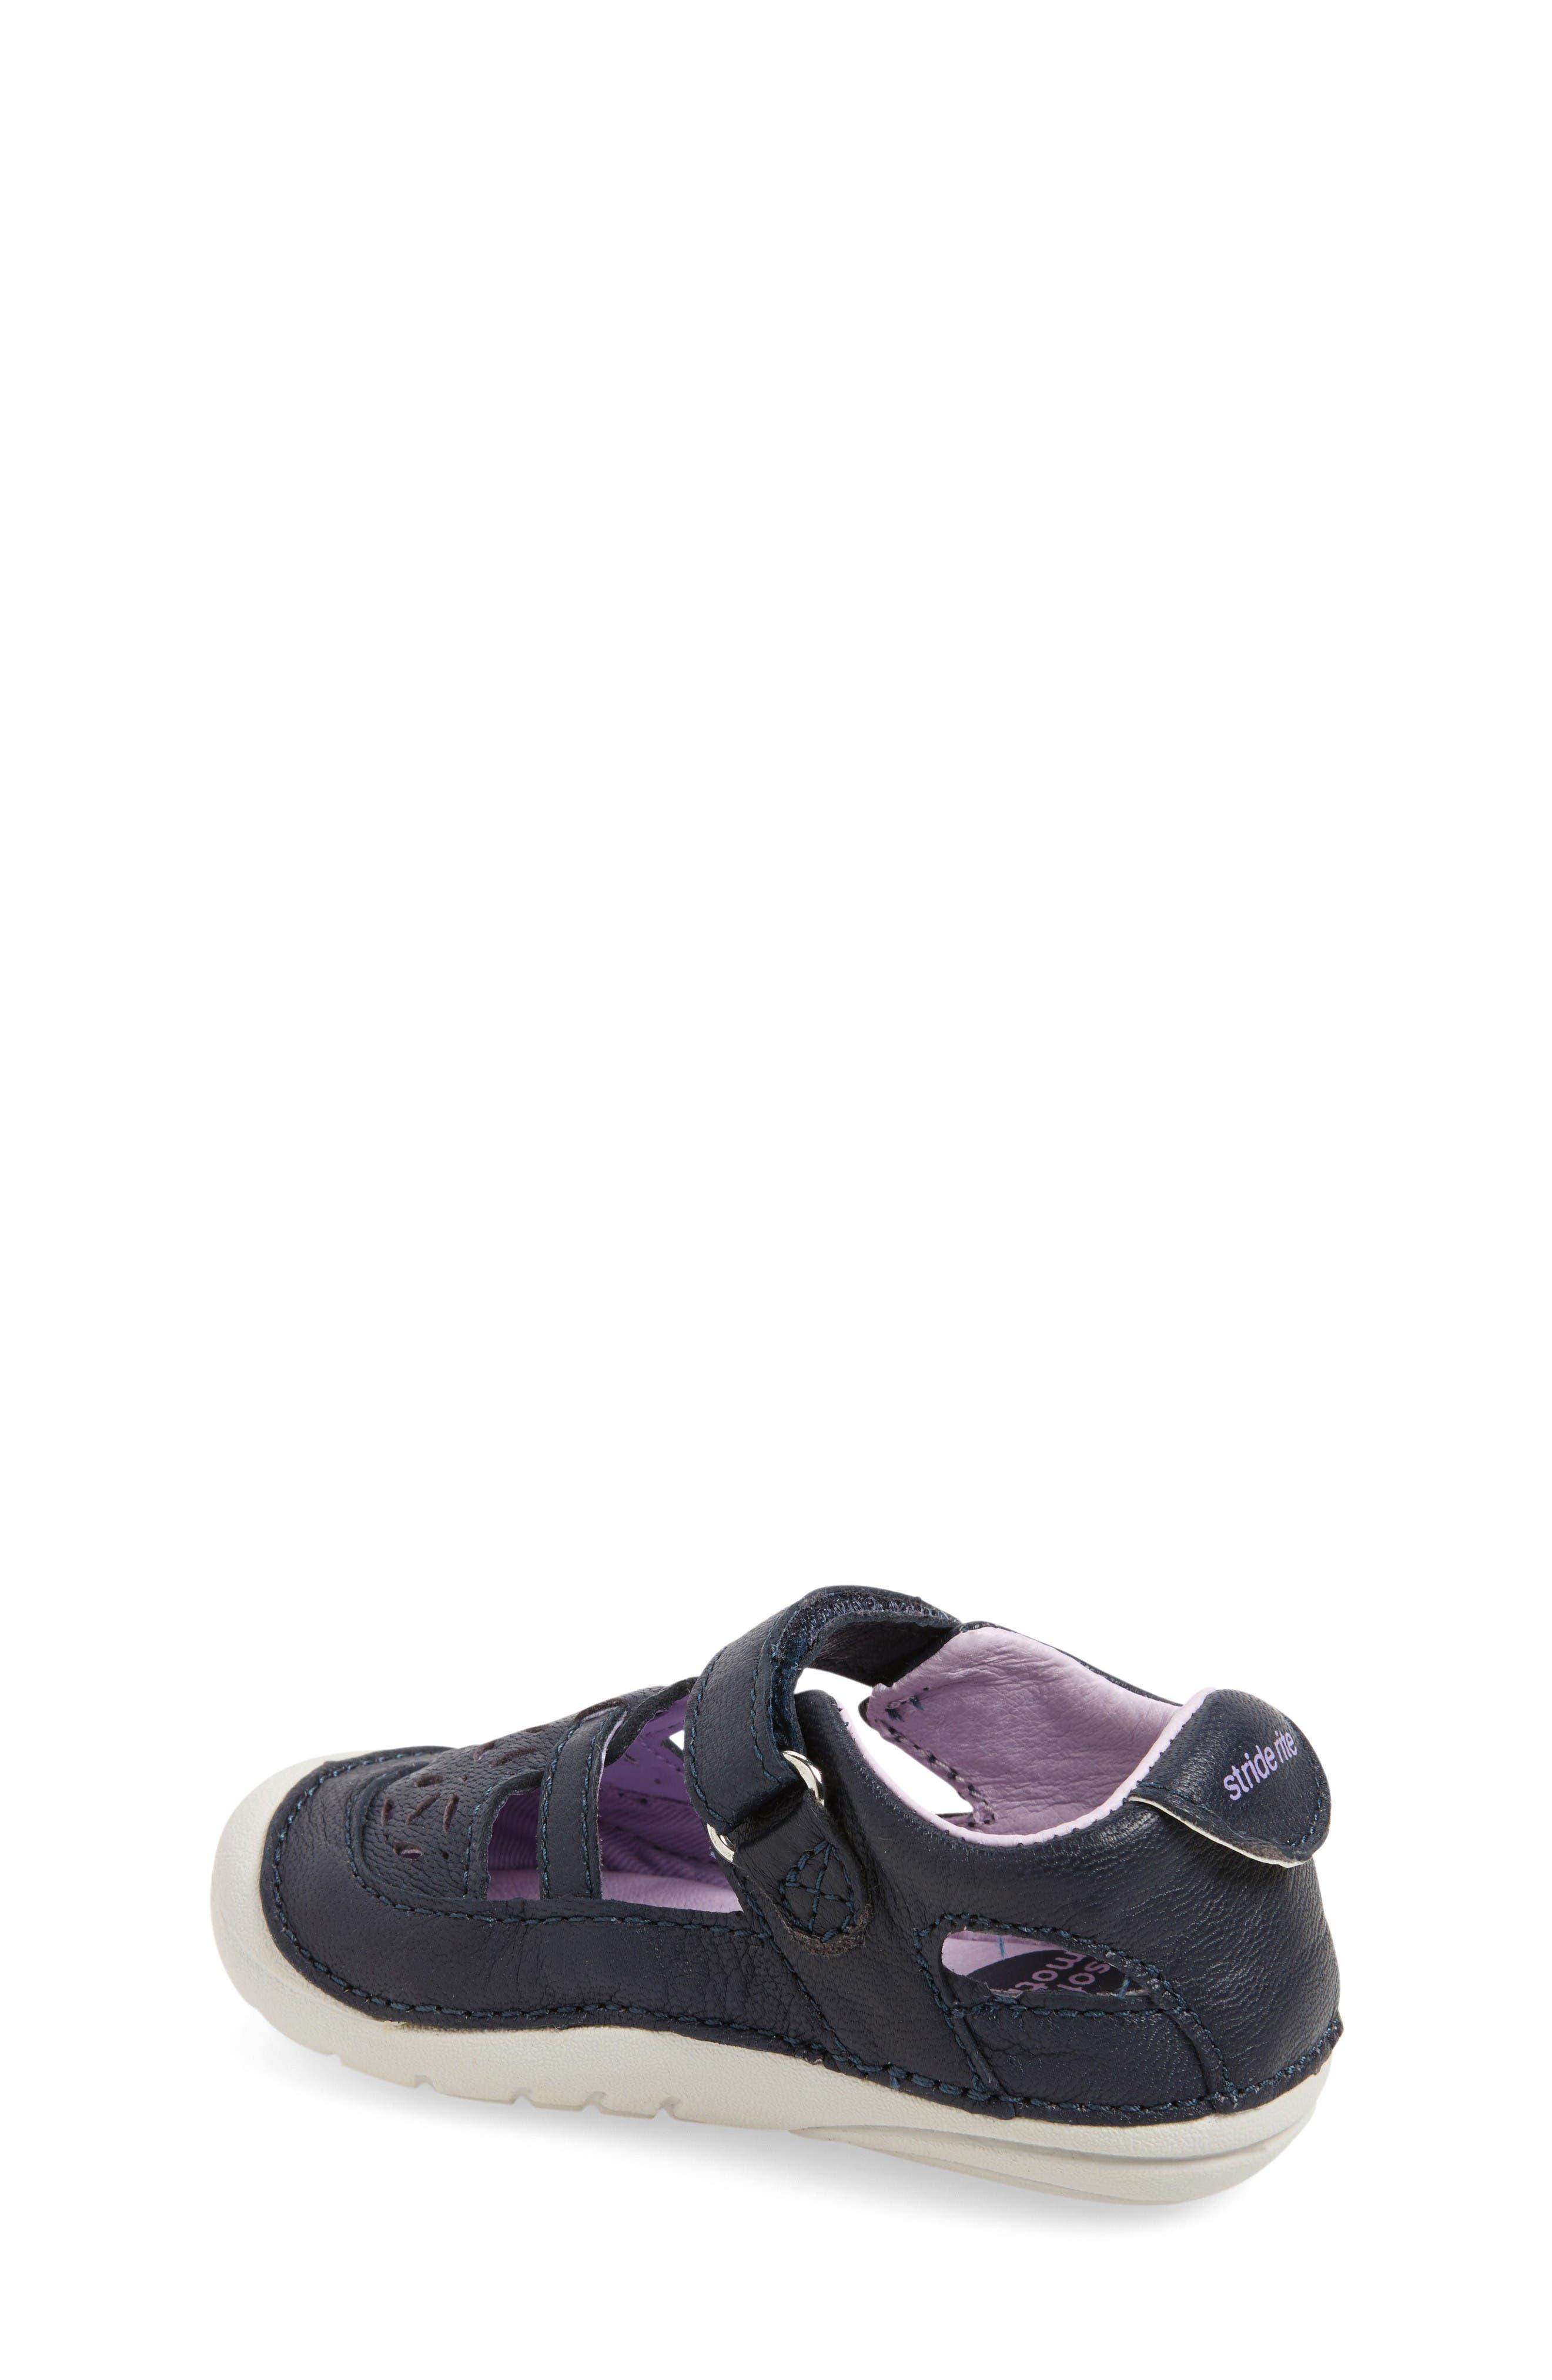 Alternate Image 2  - Stride Rite Viviana Soft Motion Sandal (Baby & Walker)